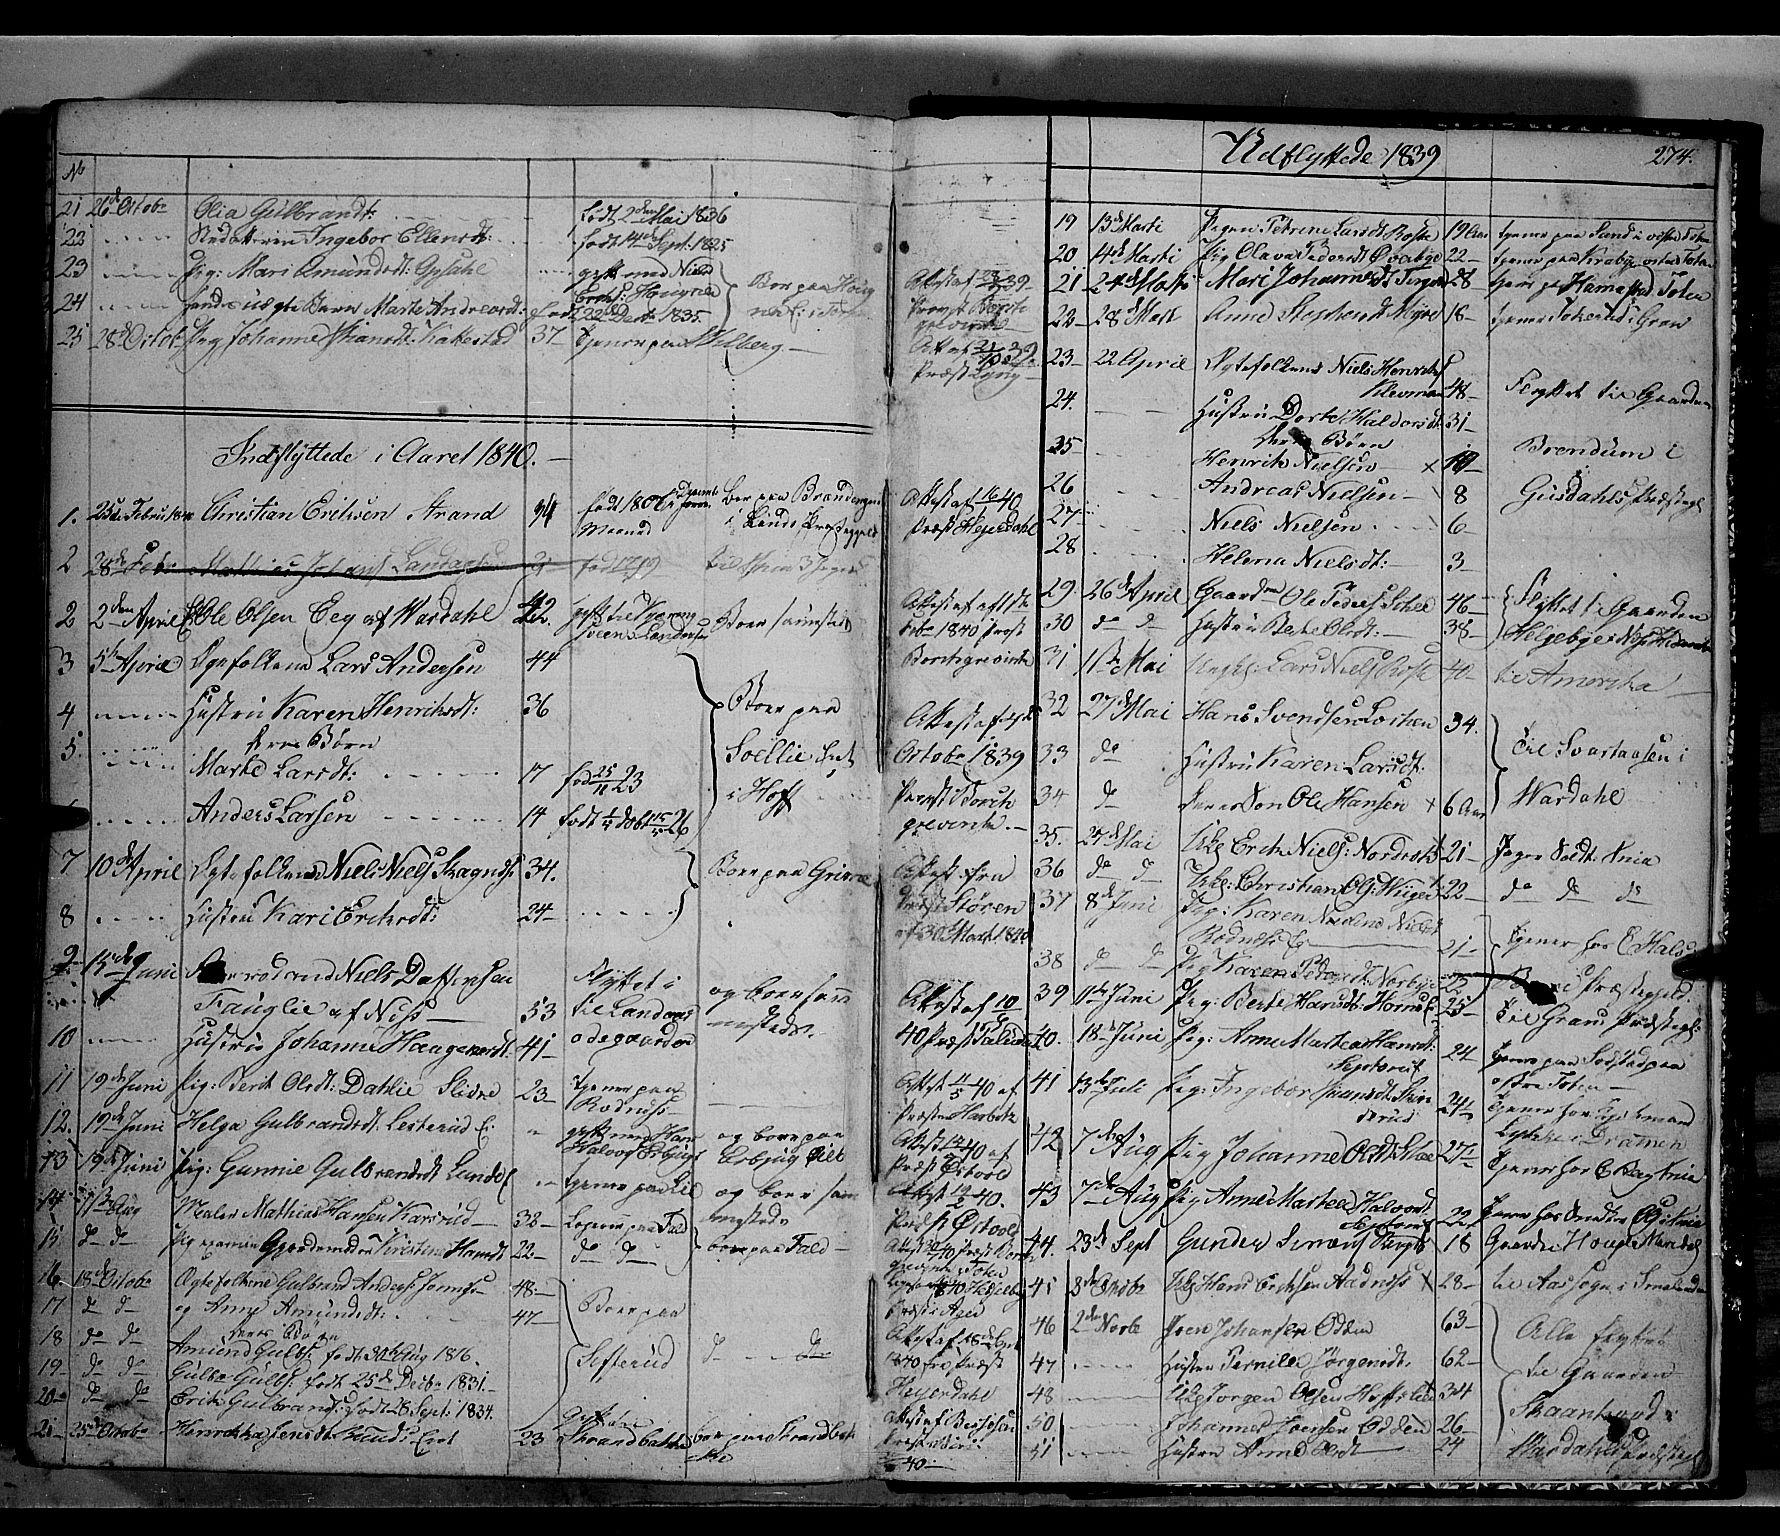 SAH, Land prestekontor, Klokkerbok nr. 2, 1833-1849, s. 274